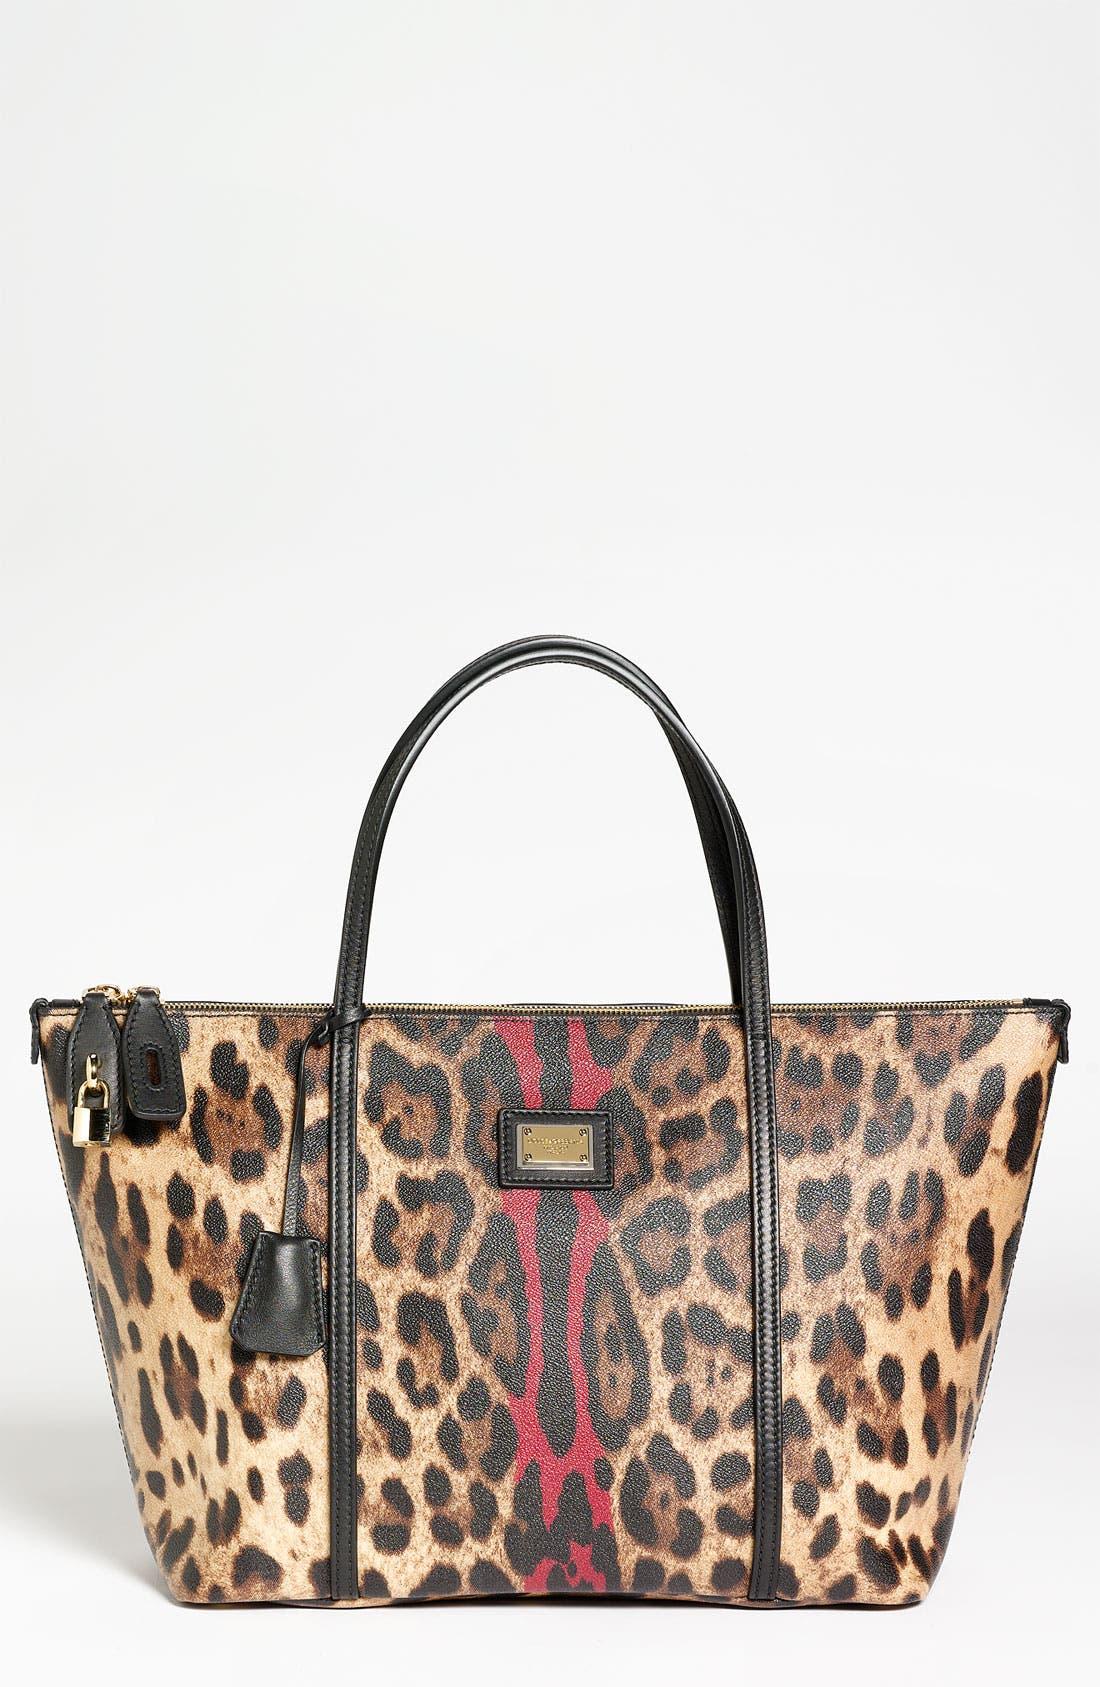 Main Image - Dolce&Gabbana 'Miss Escape' Shopper